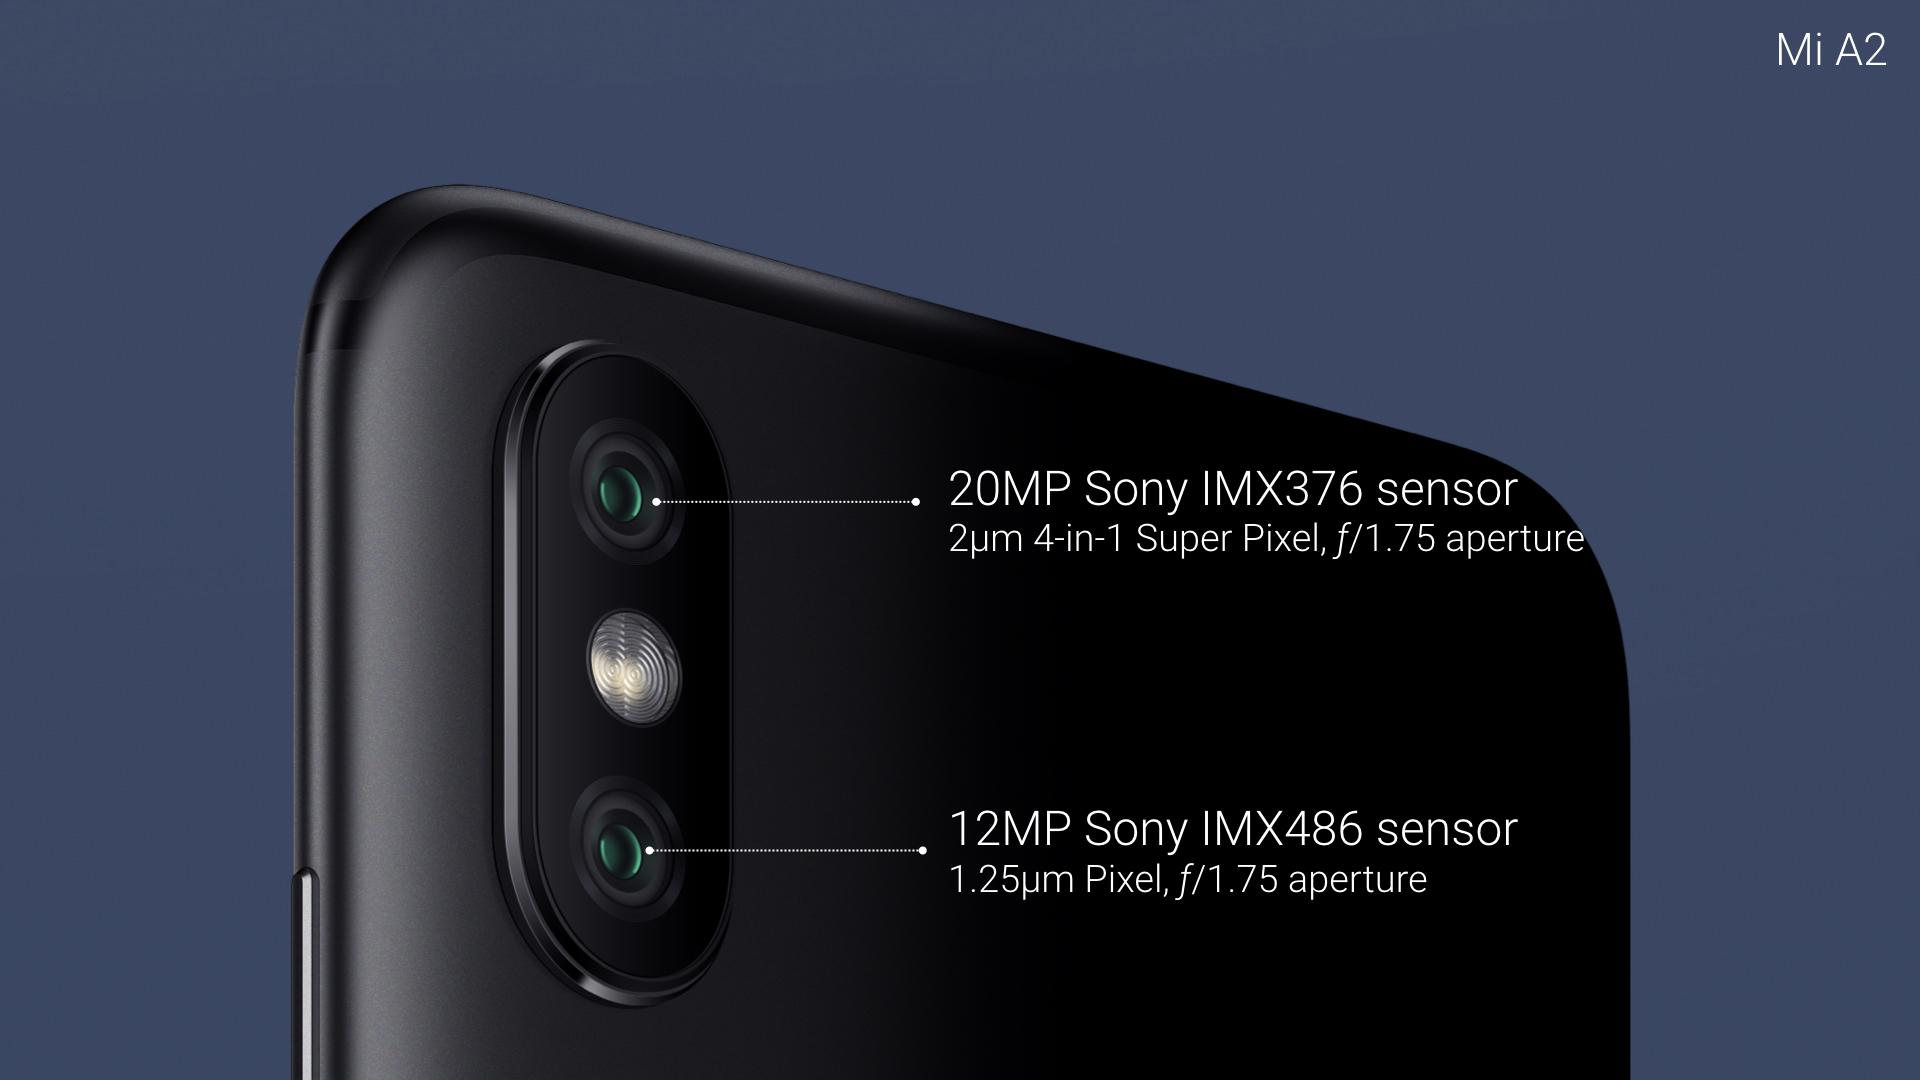 Mi A2: Know More About Rear Camera - Tech - Mi Community